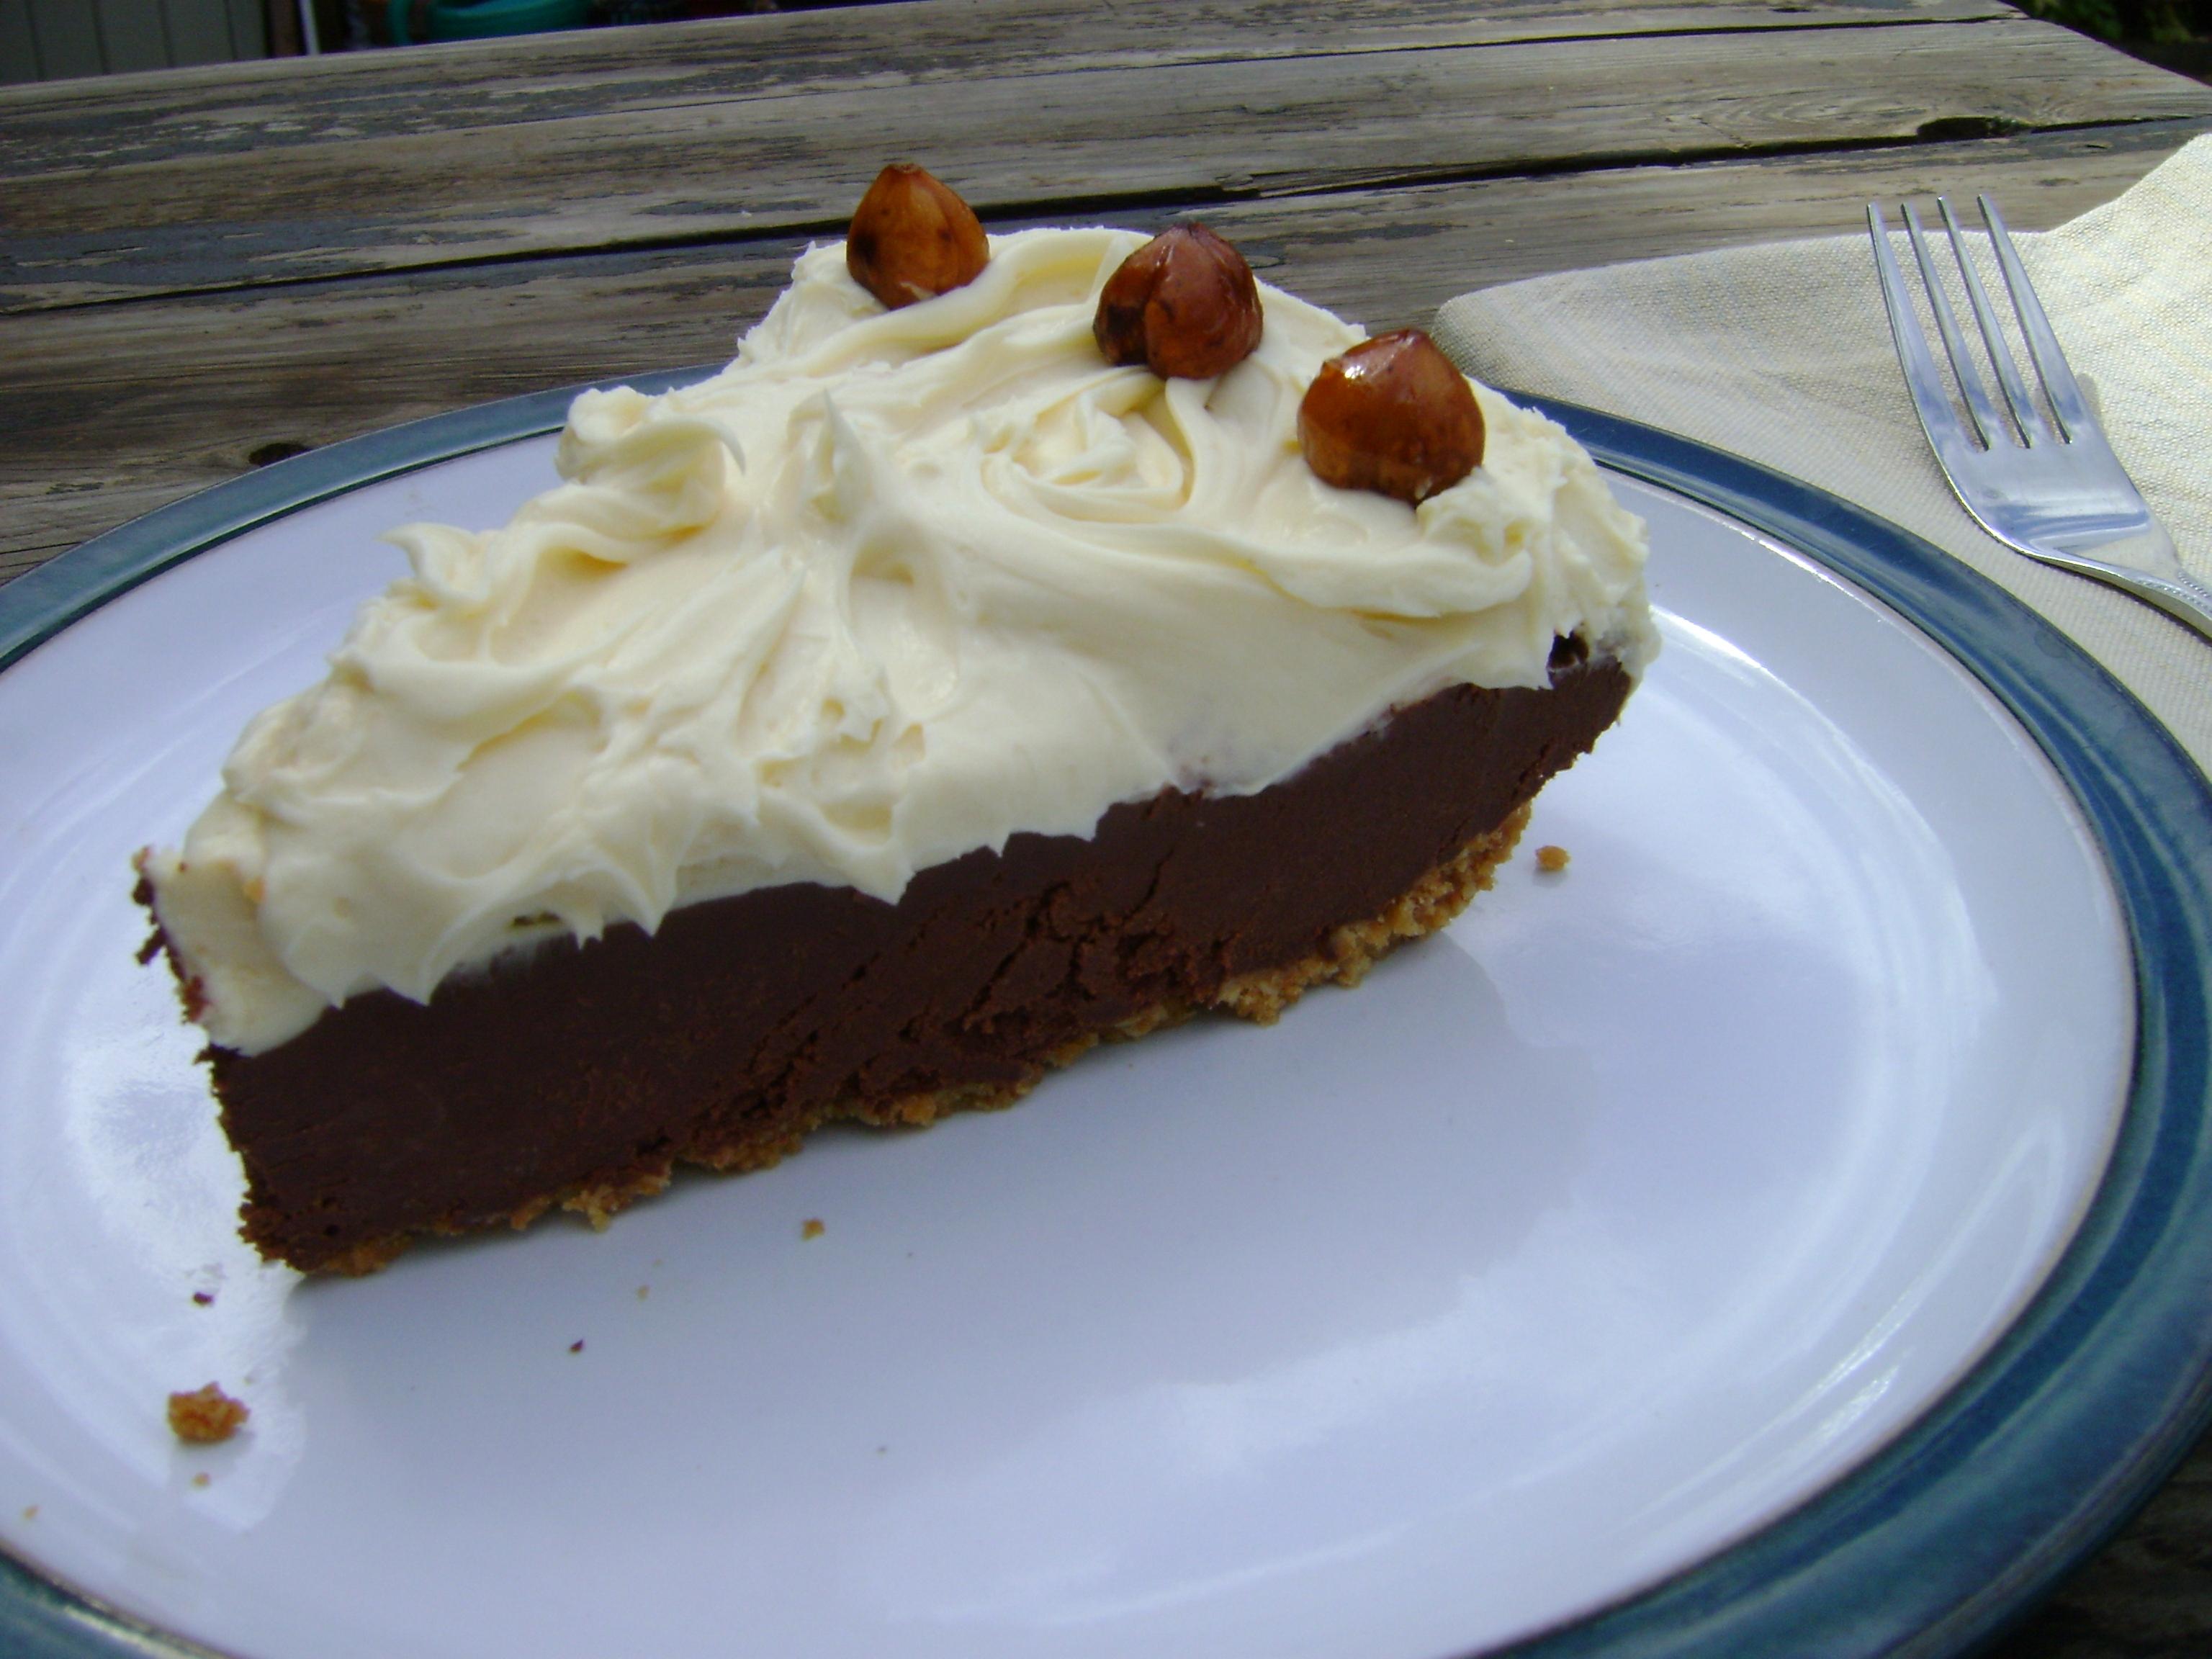 Chocolate Hazelnut Pie With Frangelico We're Baking With Abby Dodge ...